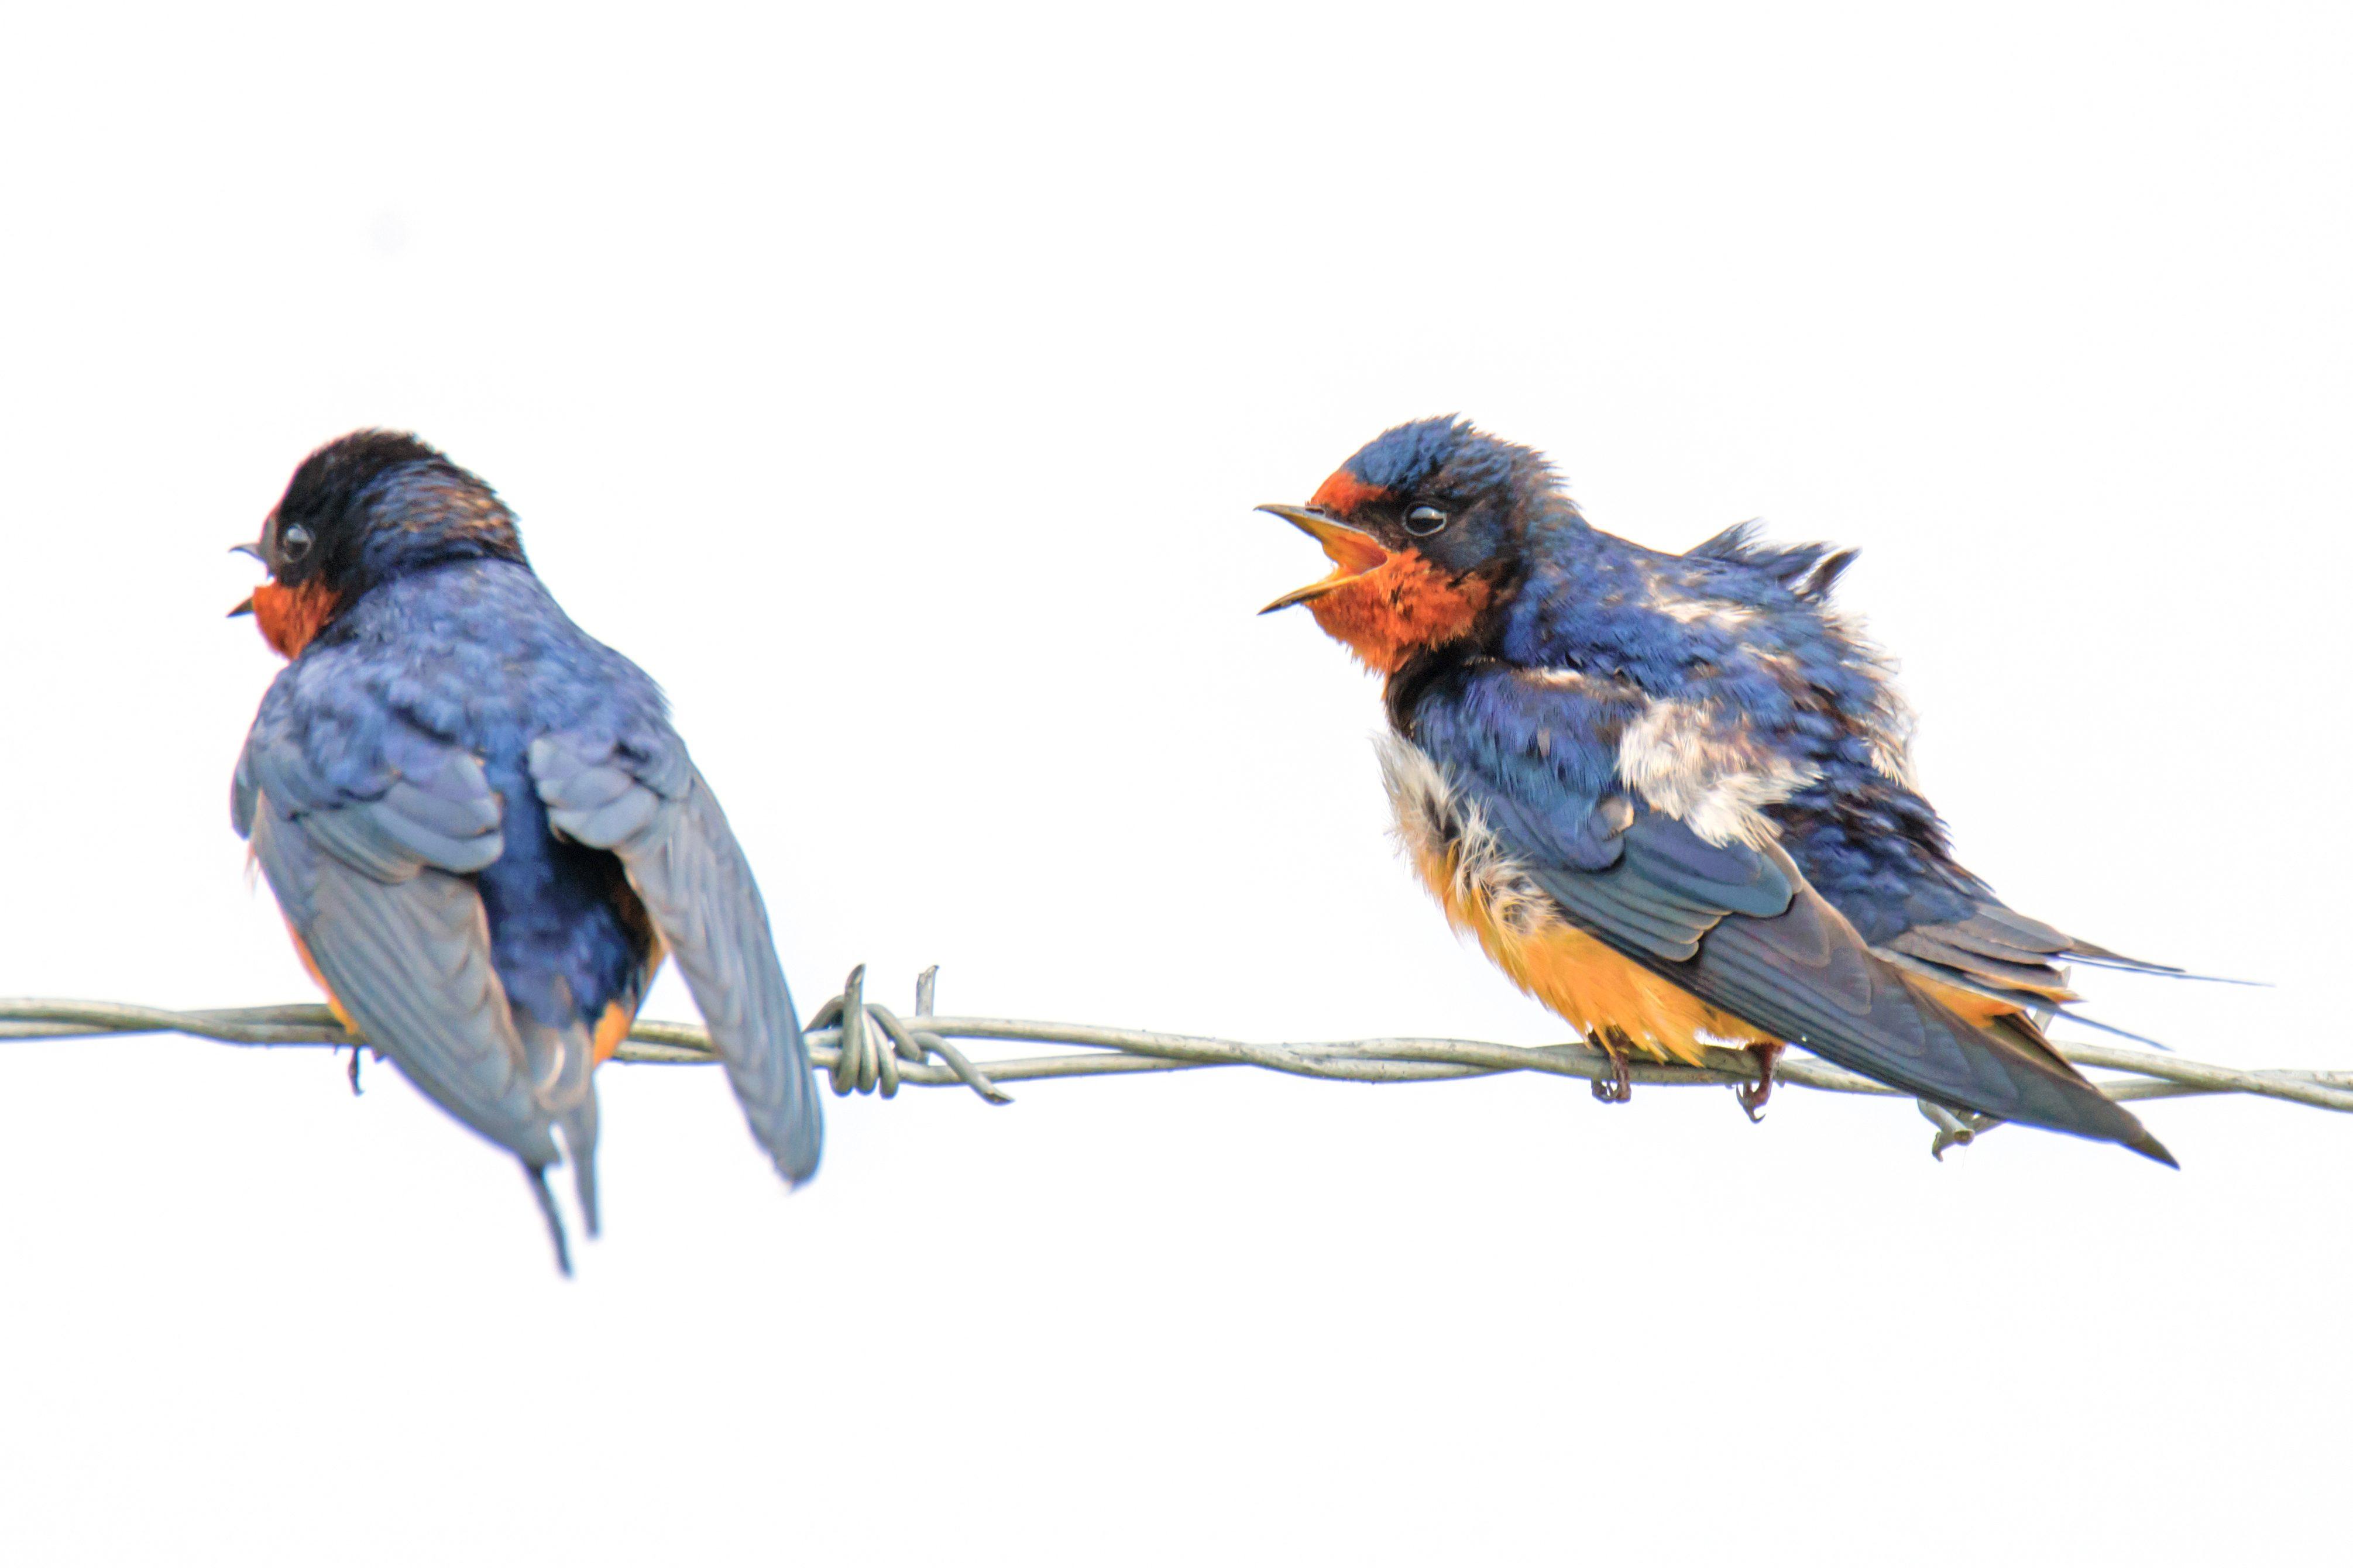 Squabbling Barn Swallows - Birds and Blooms